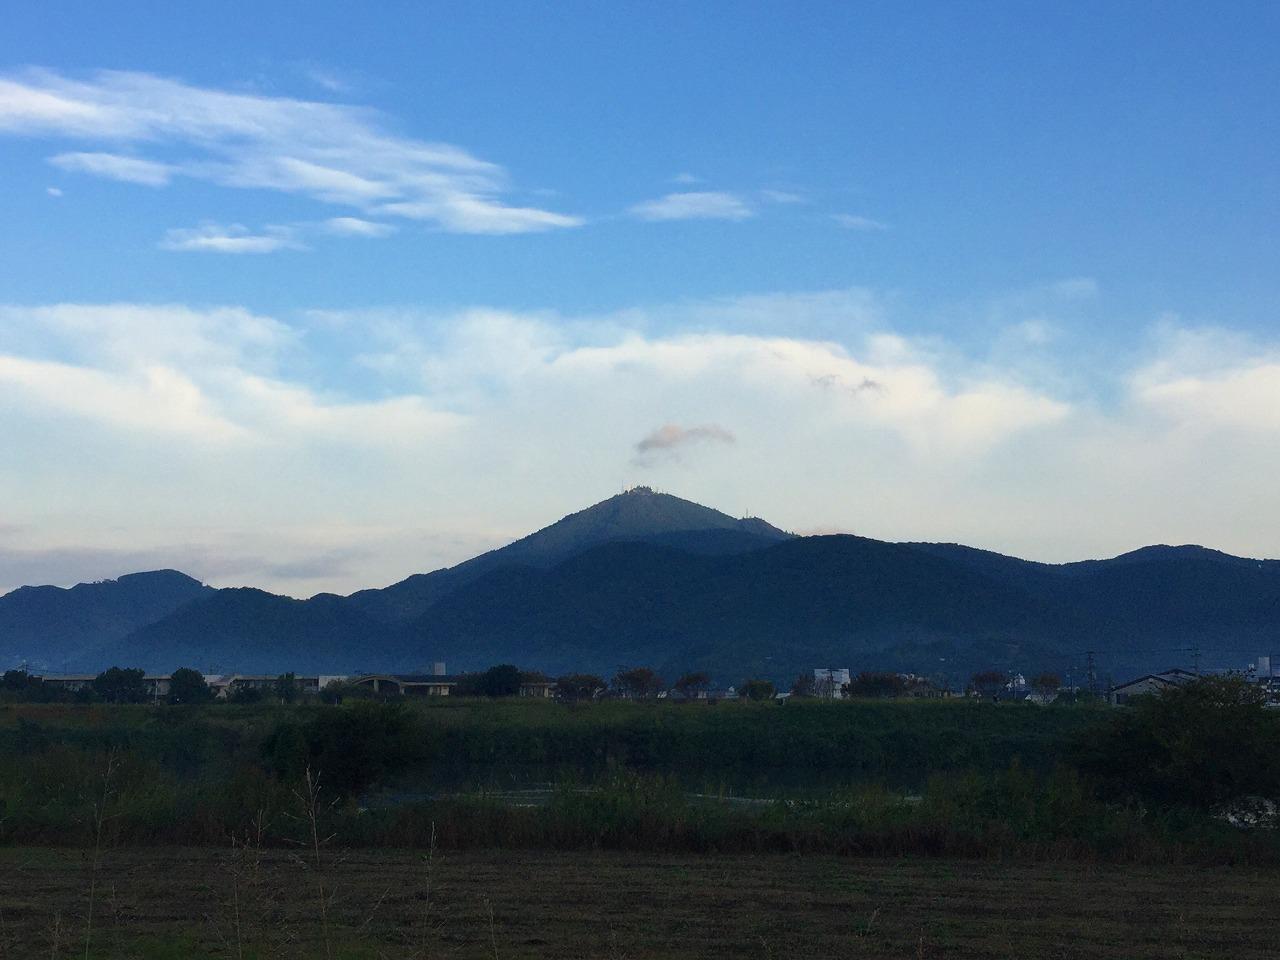 今朝の金峰山 2016.11.1